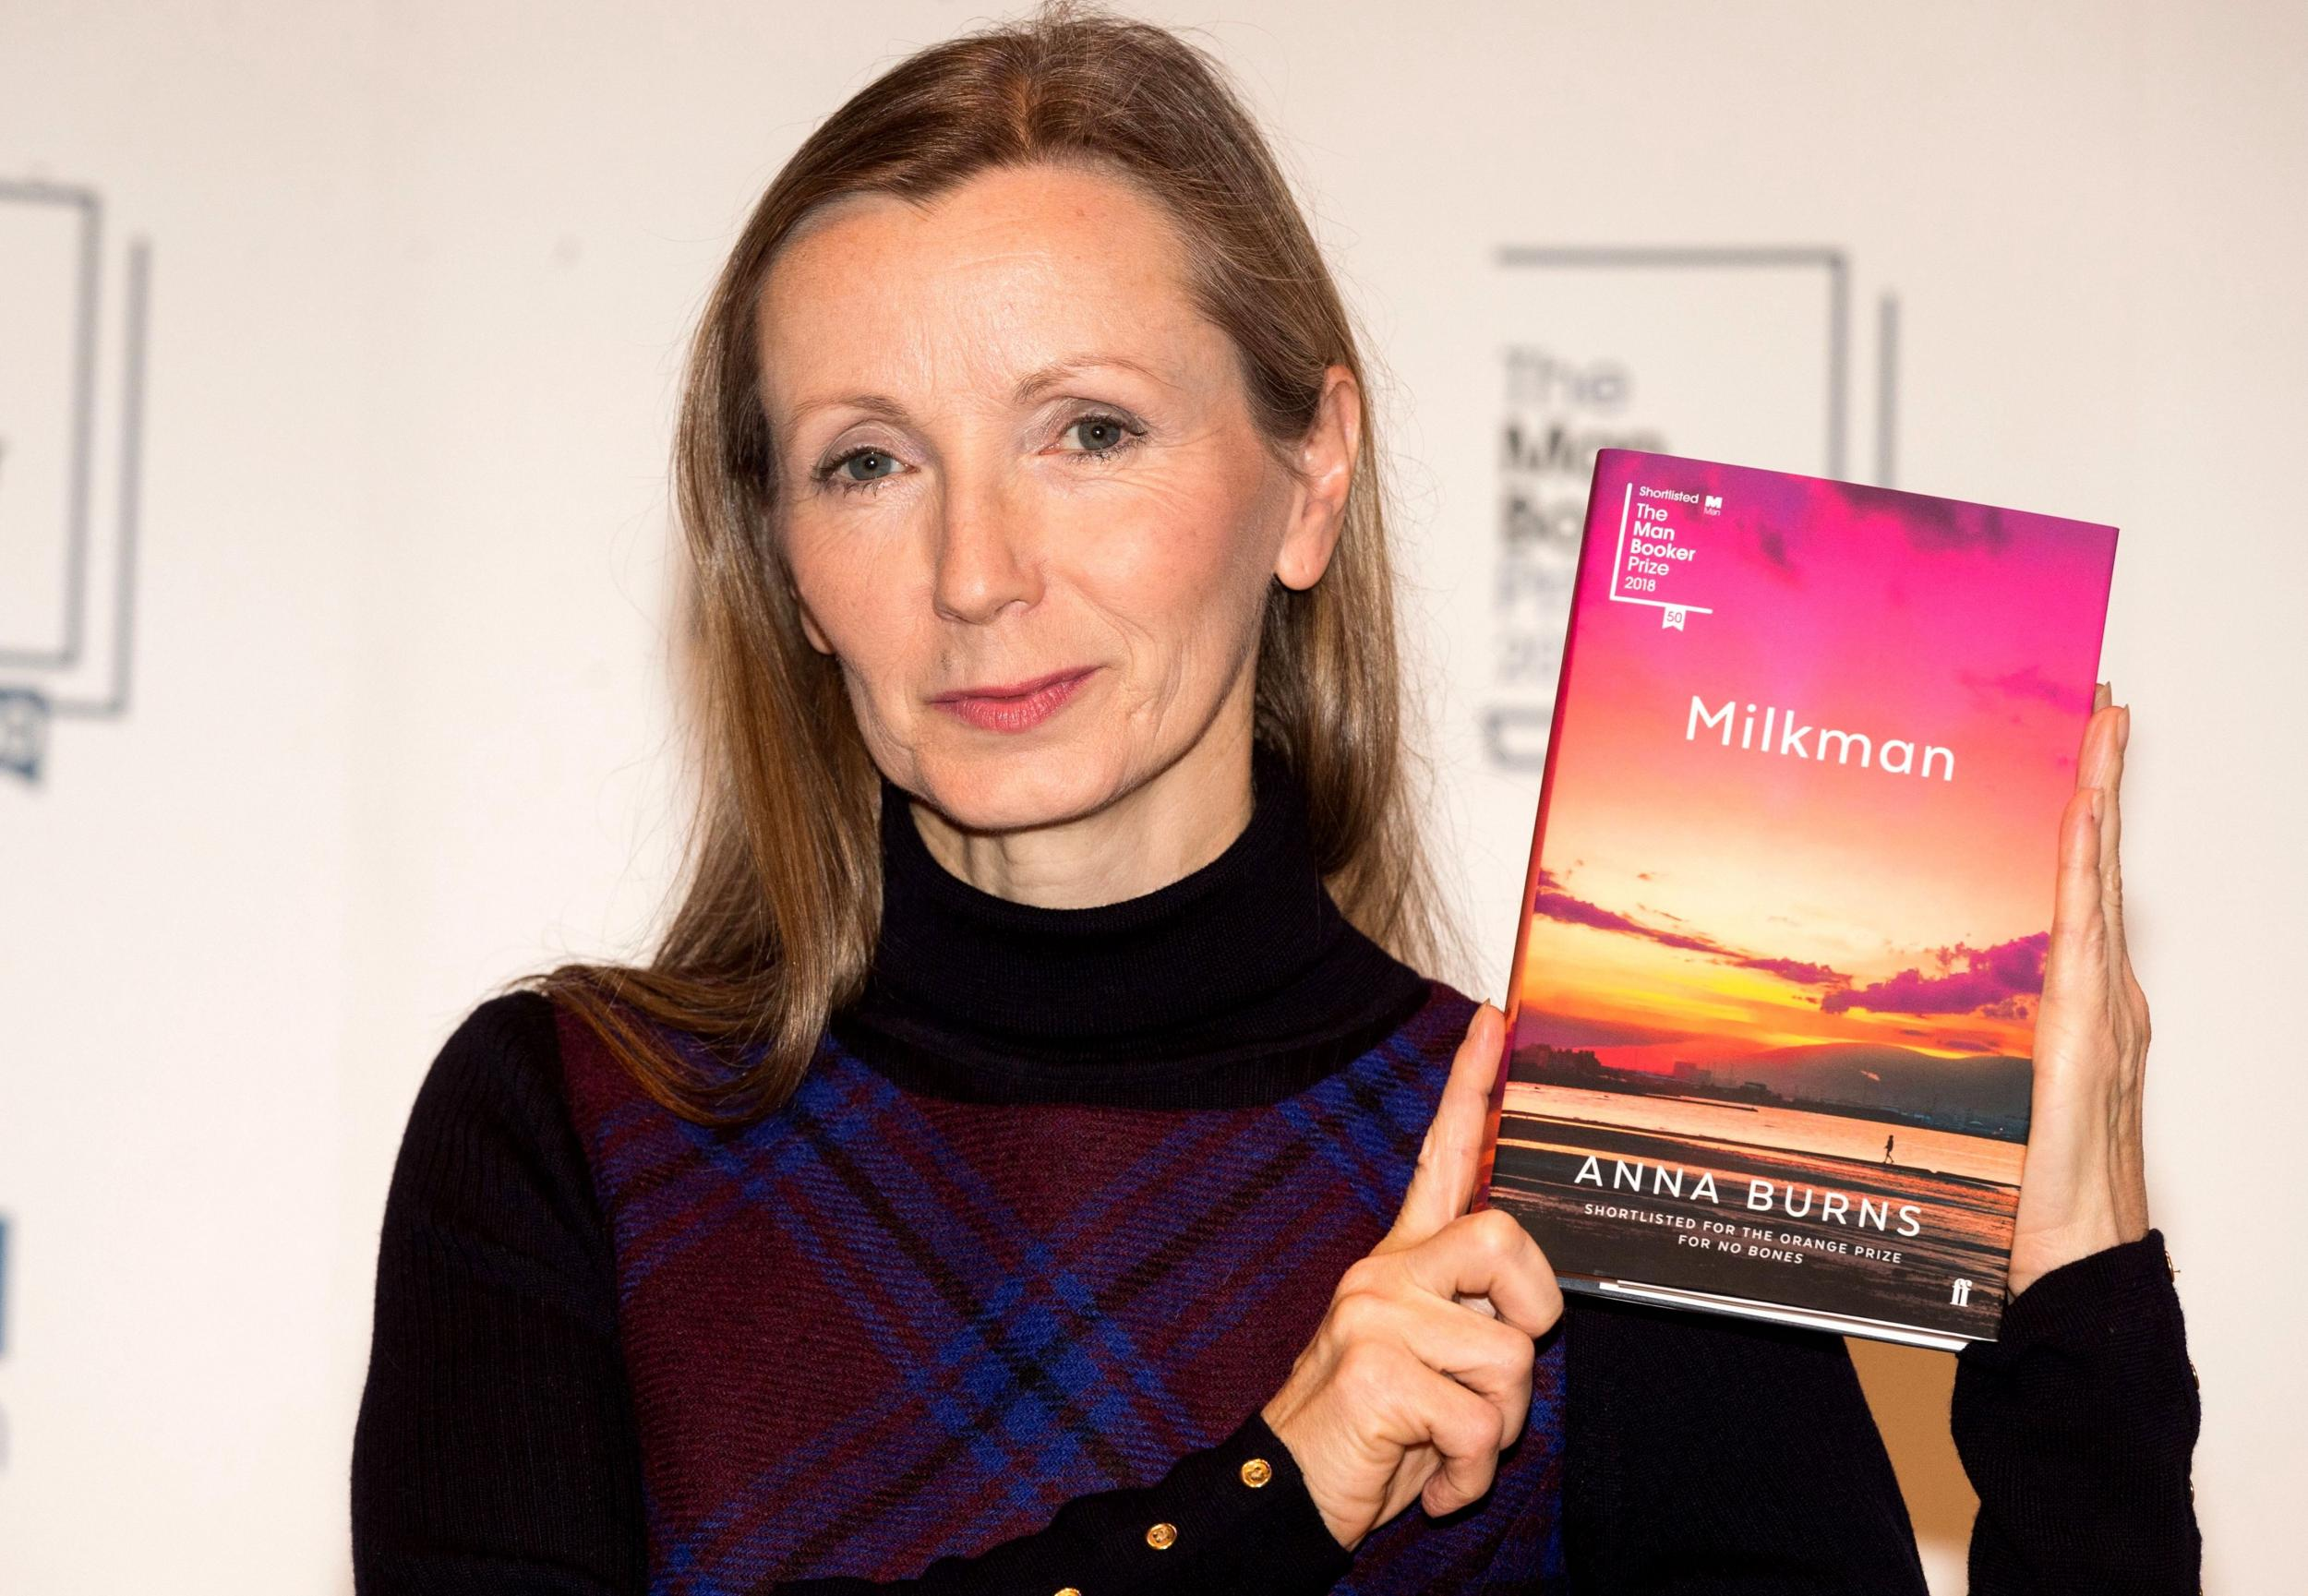 Man Booker Prize 2018 winner: Anna Burns becomes first Northern Irish author to win prestigious award for 'Milkman'